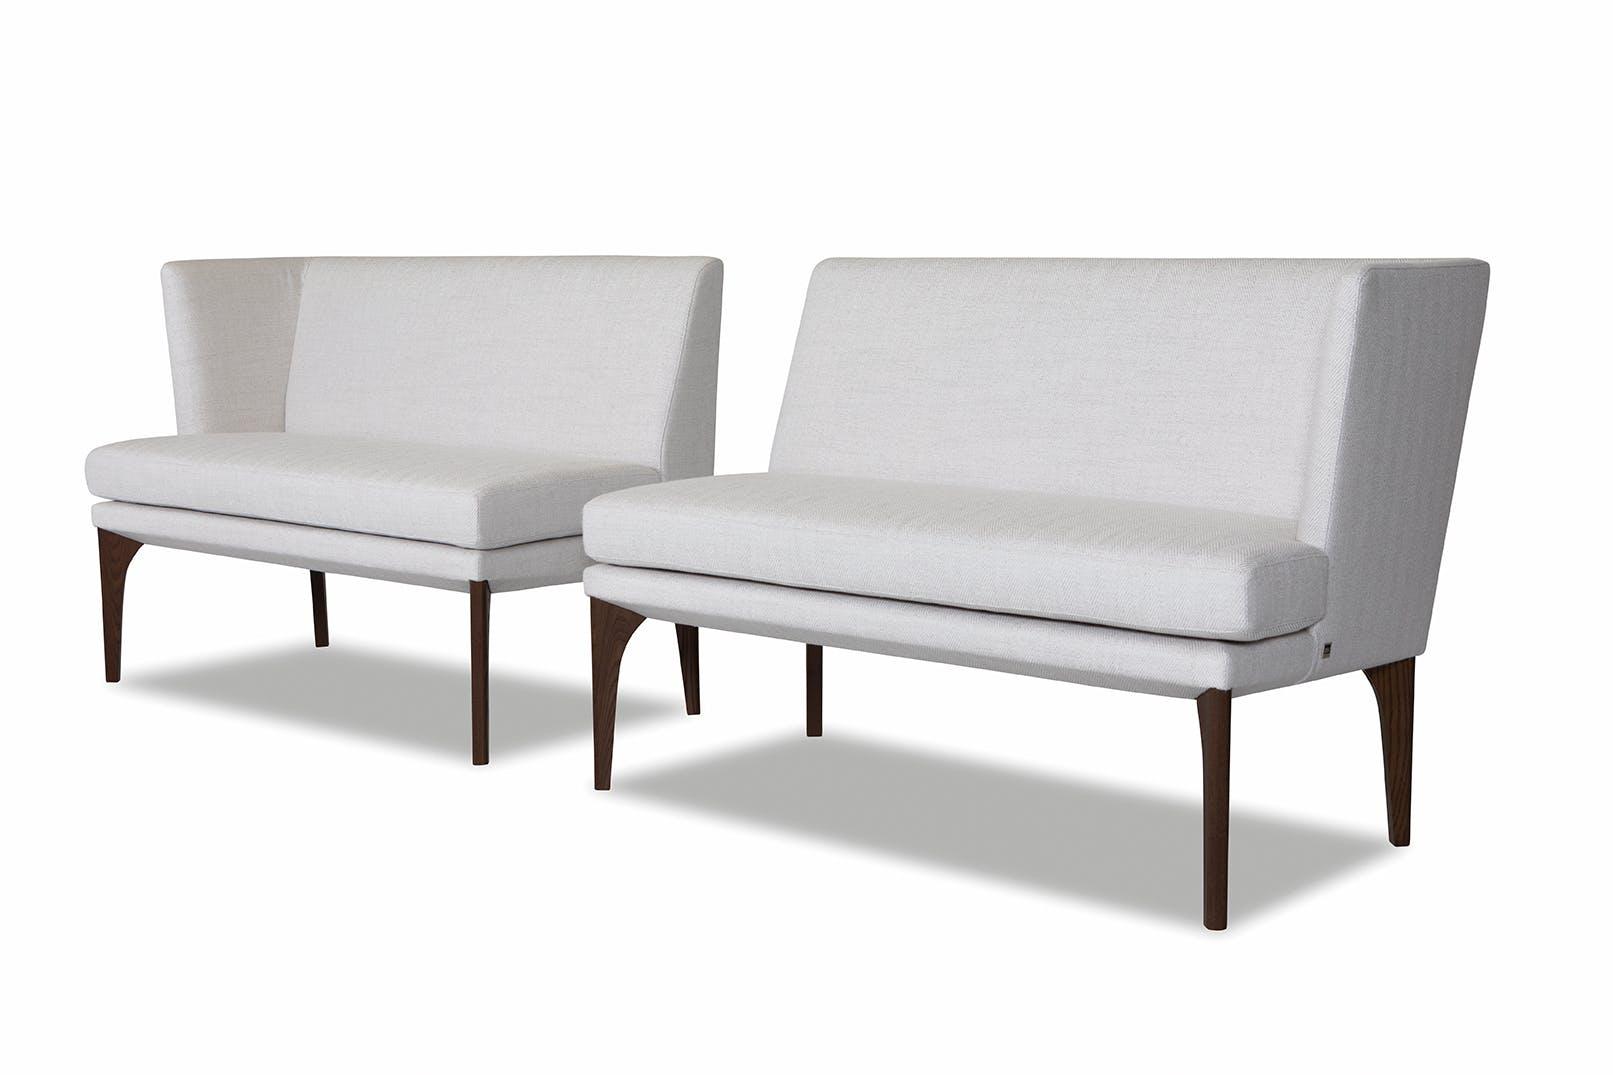 Jab Anstoetz Polo Petite Sofa Haute Living